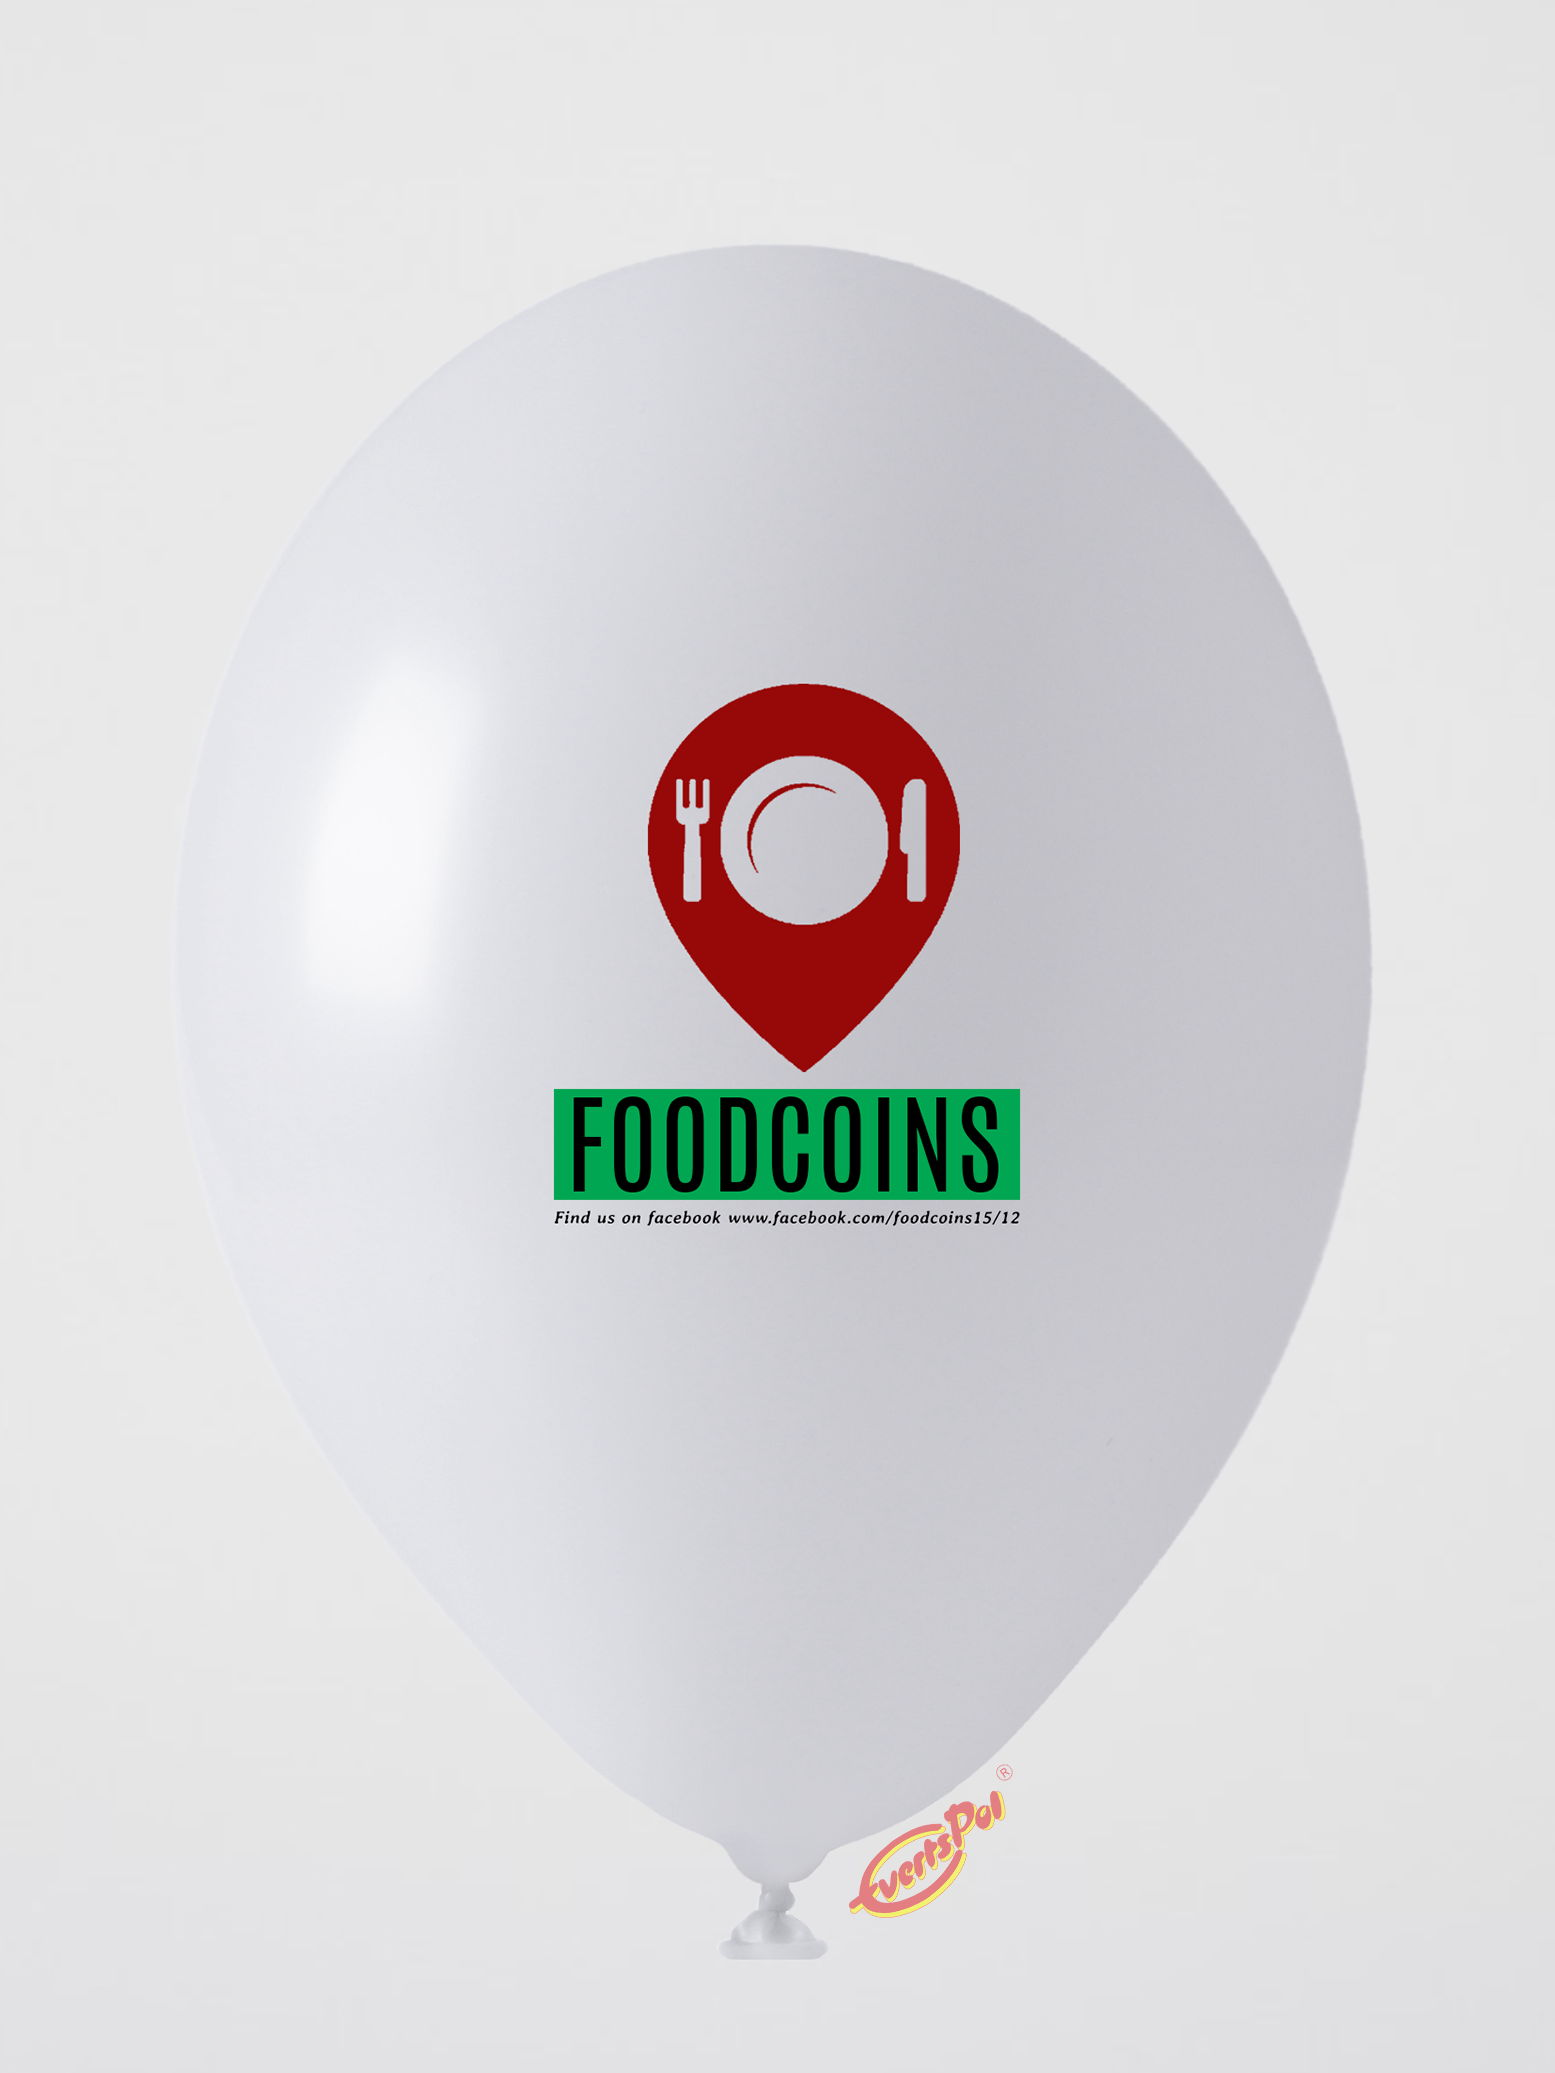 100 foodcoins